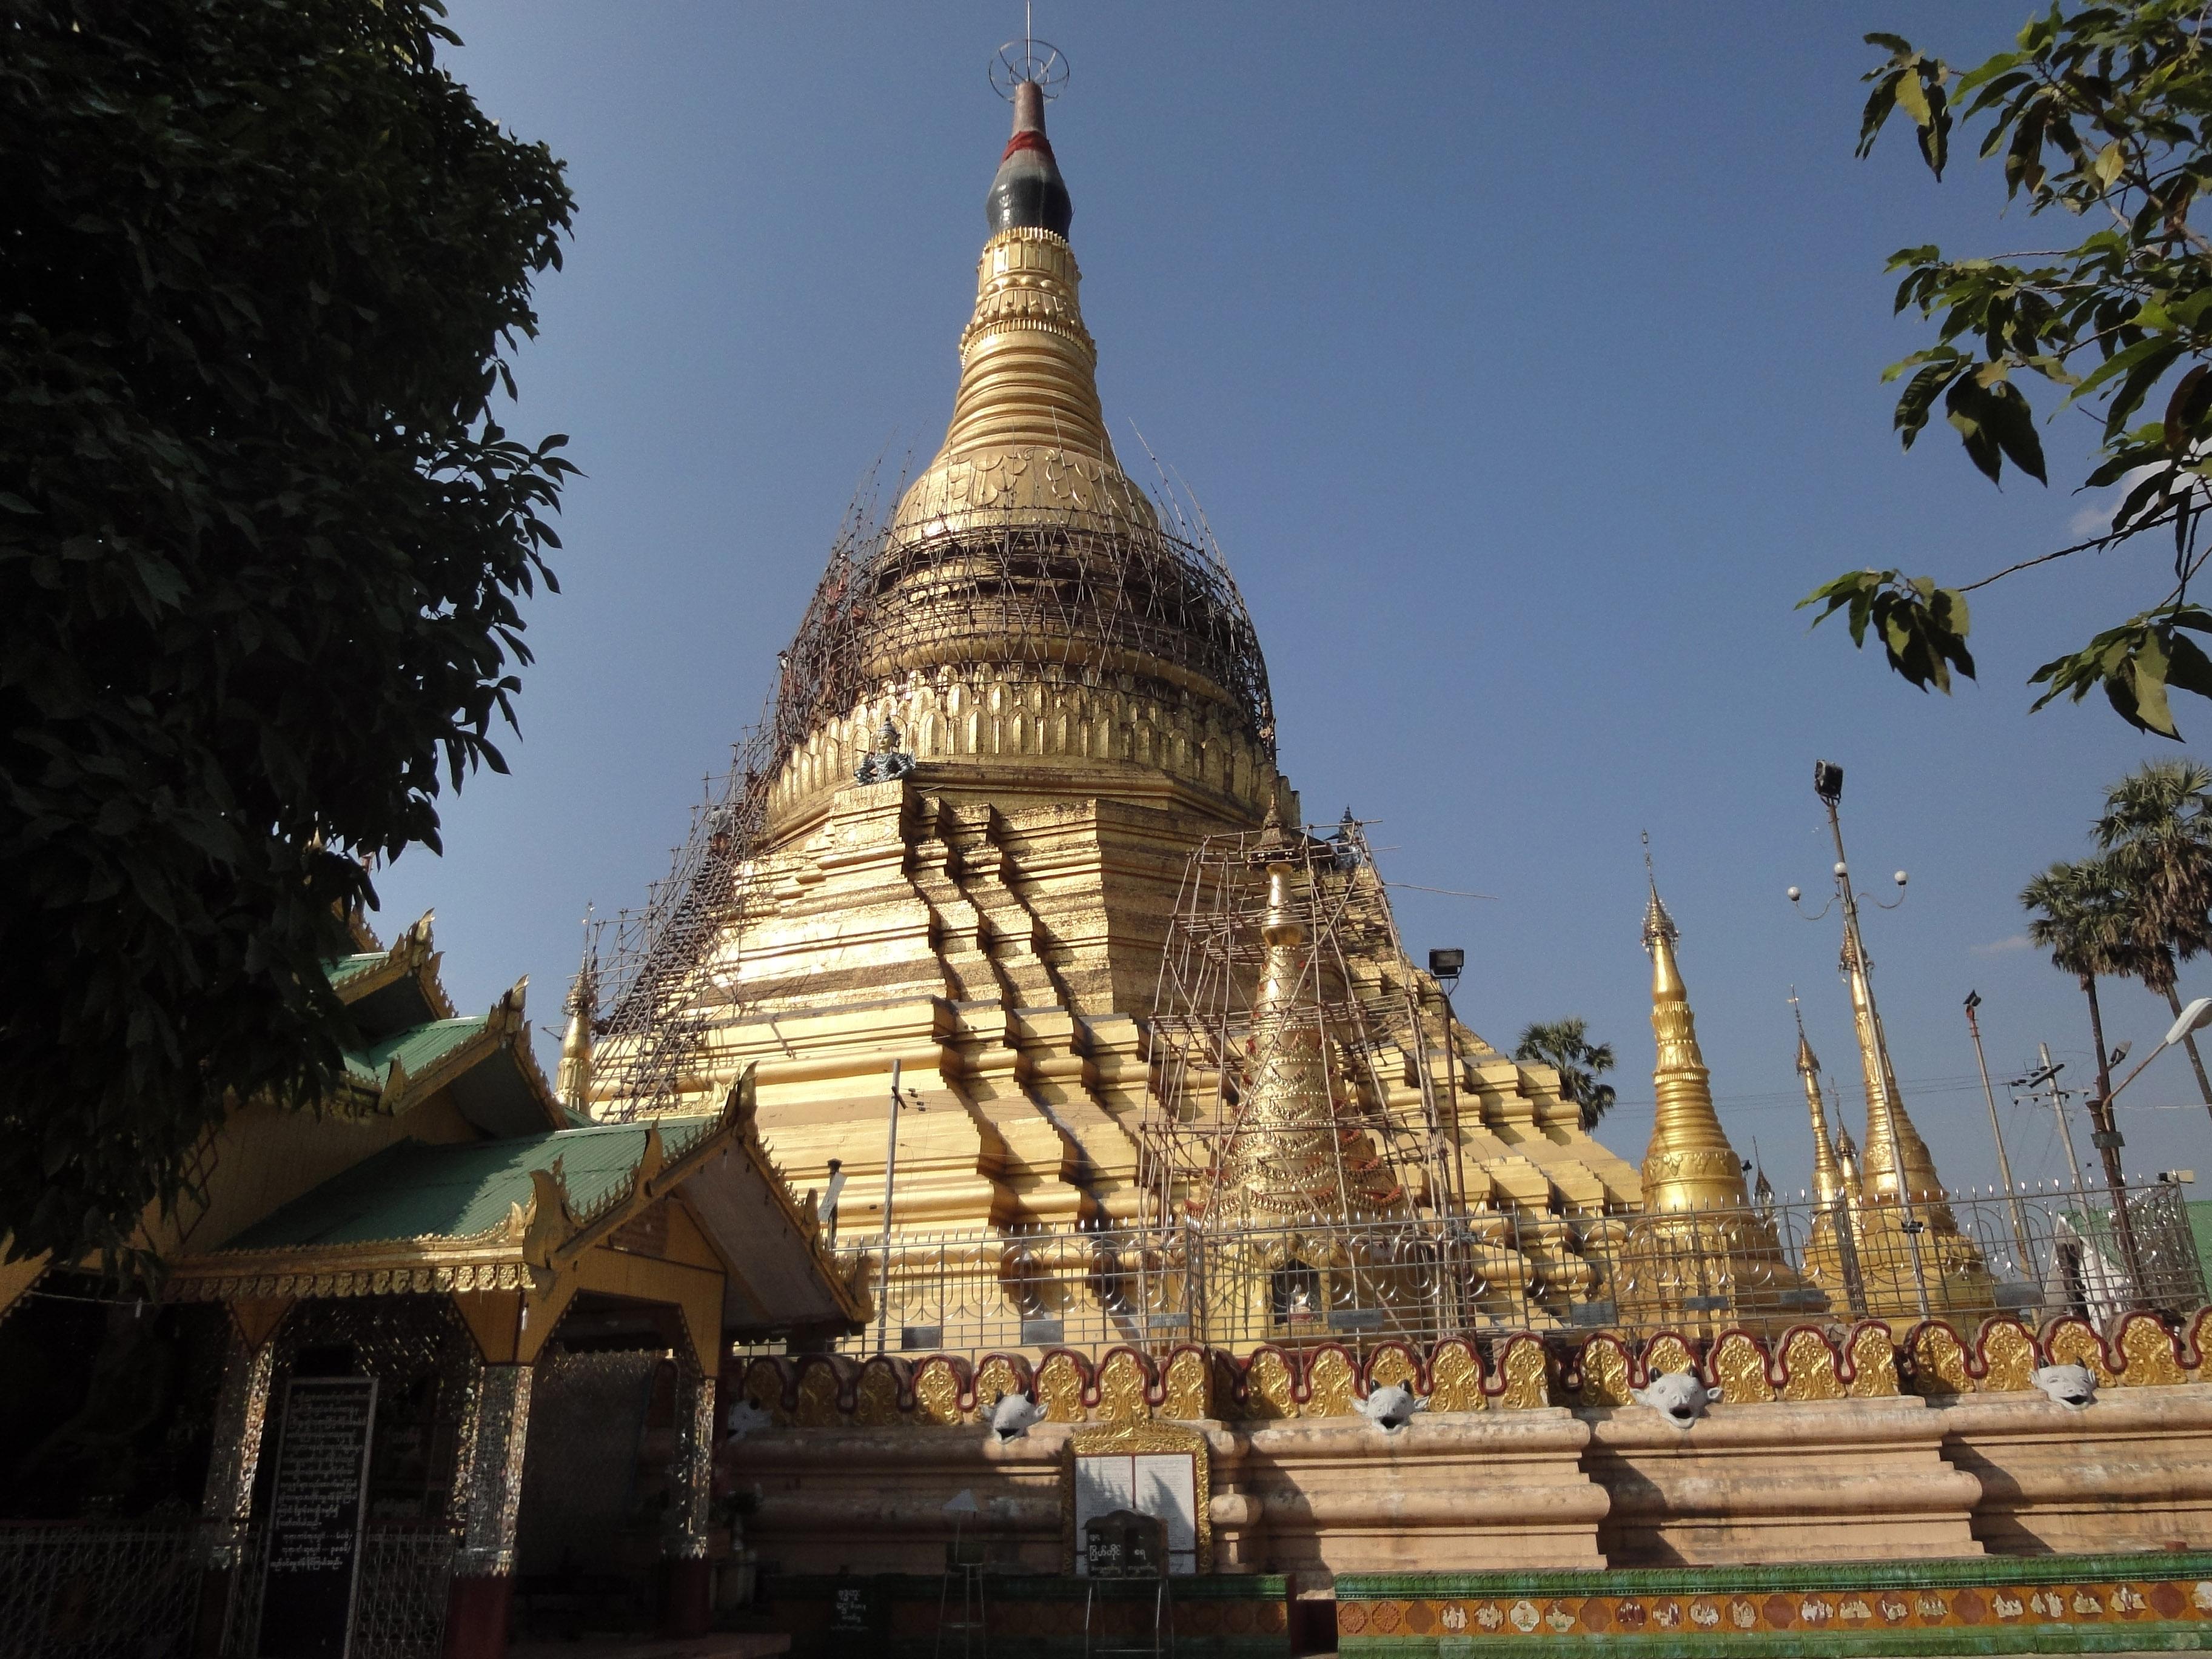 Kyaik Ka San Pagoda South Oak ka lar township Yangon Dec 2009 20